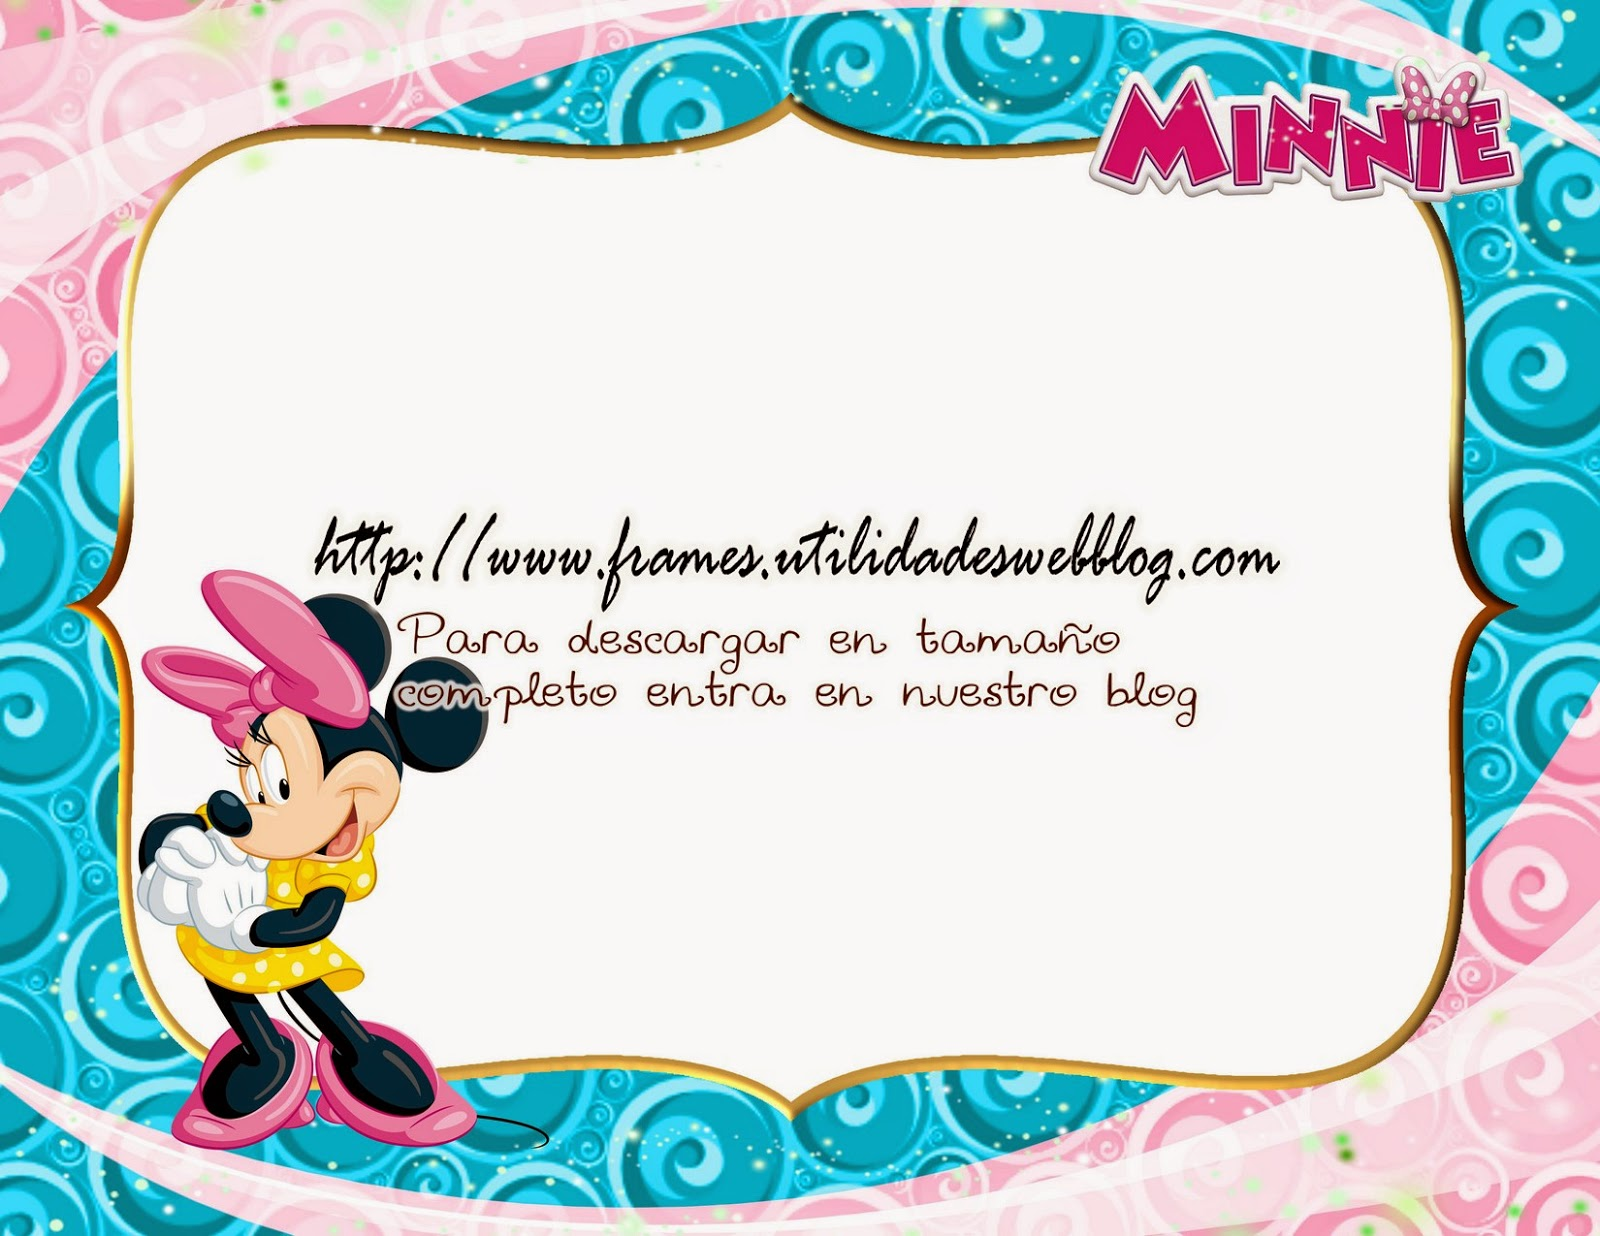 Marco para hacer fotomontajes de Mimi o Minnie Mouse